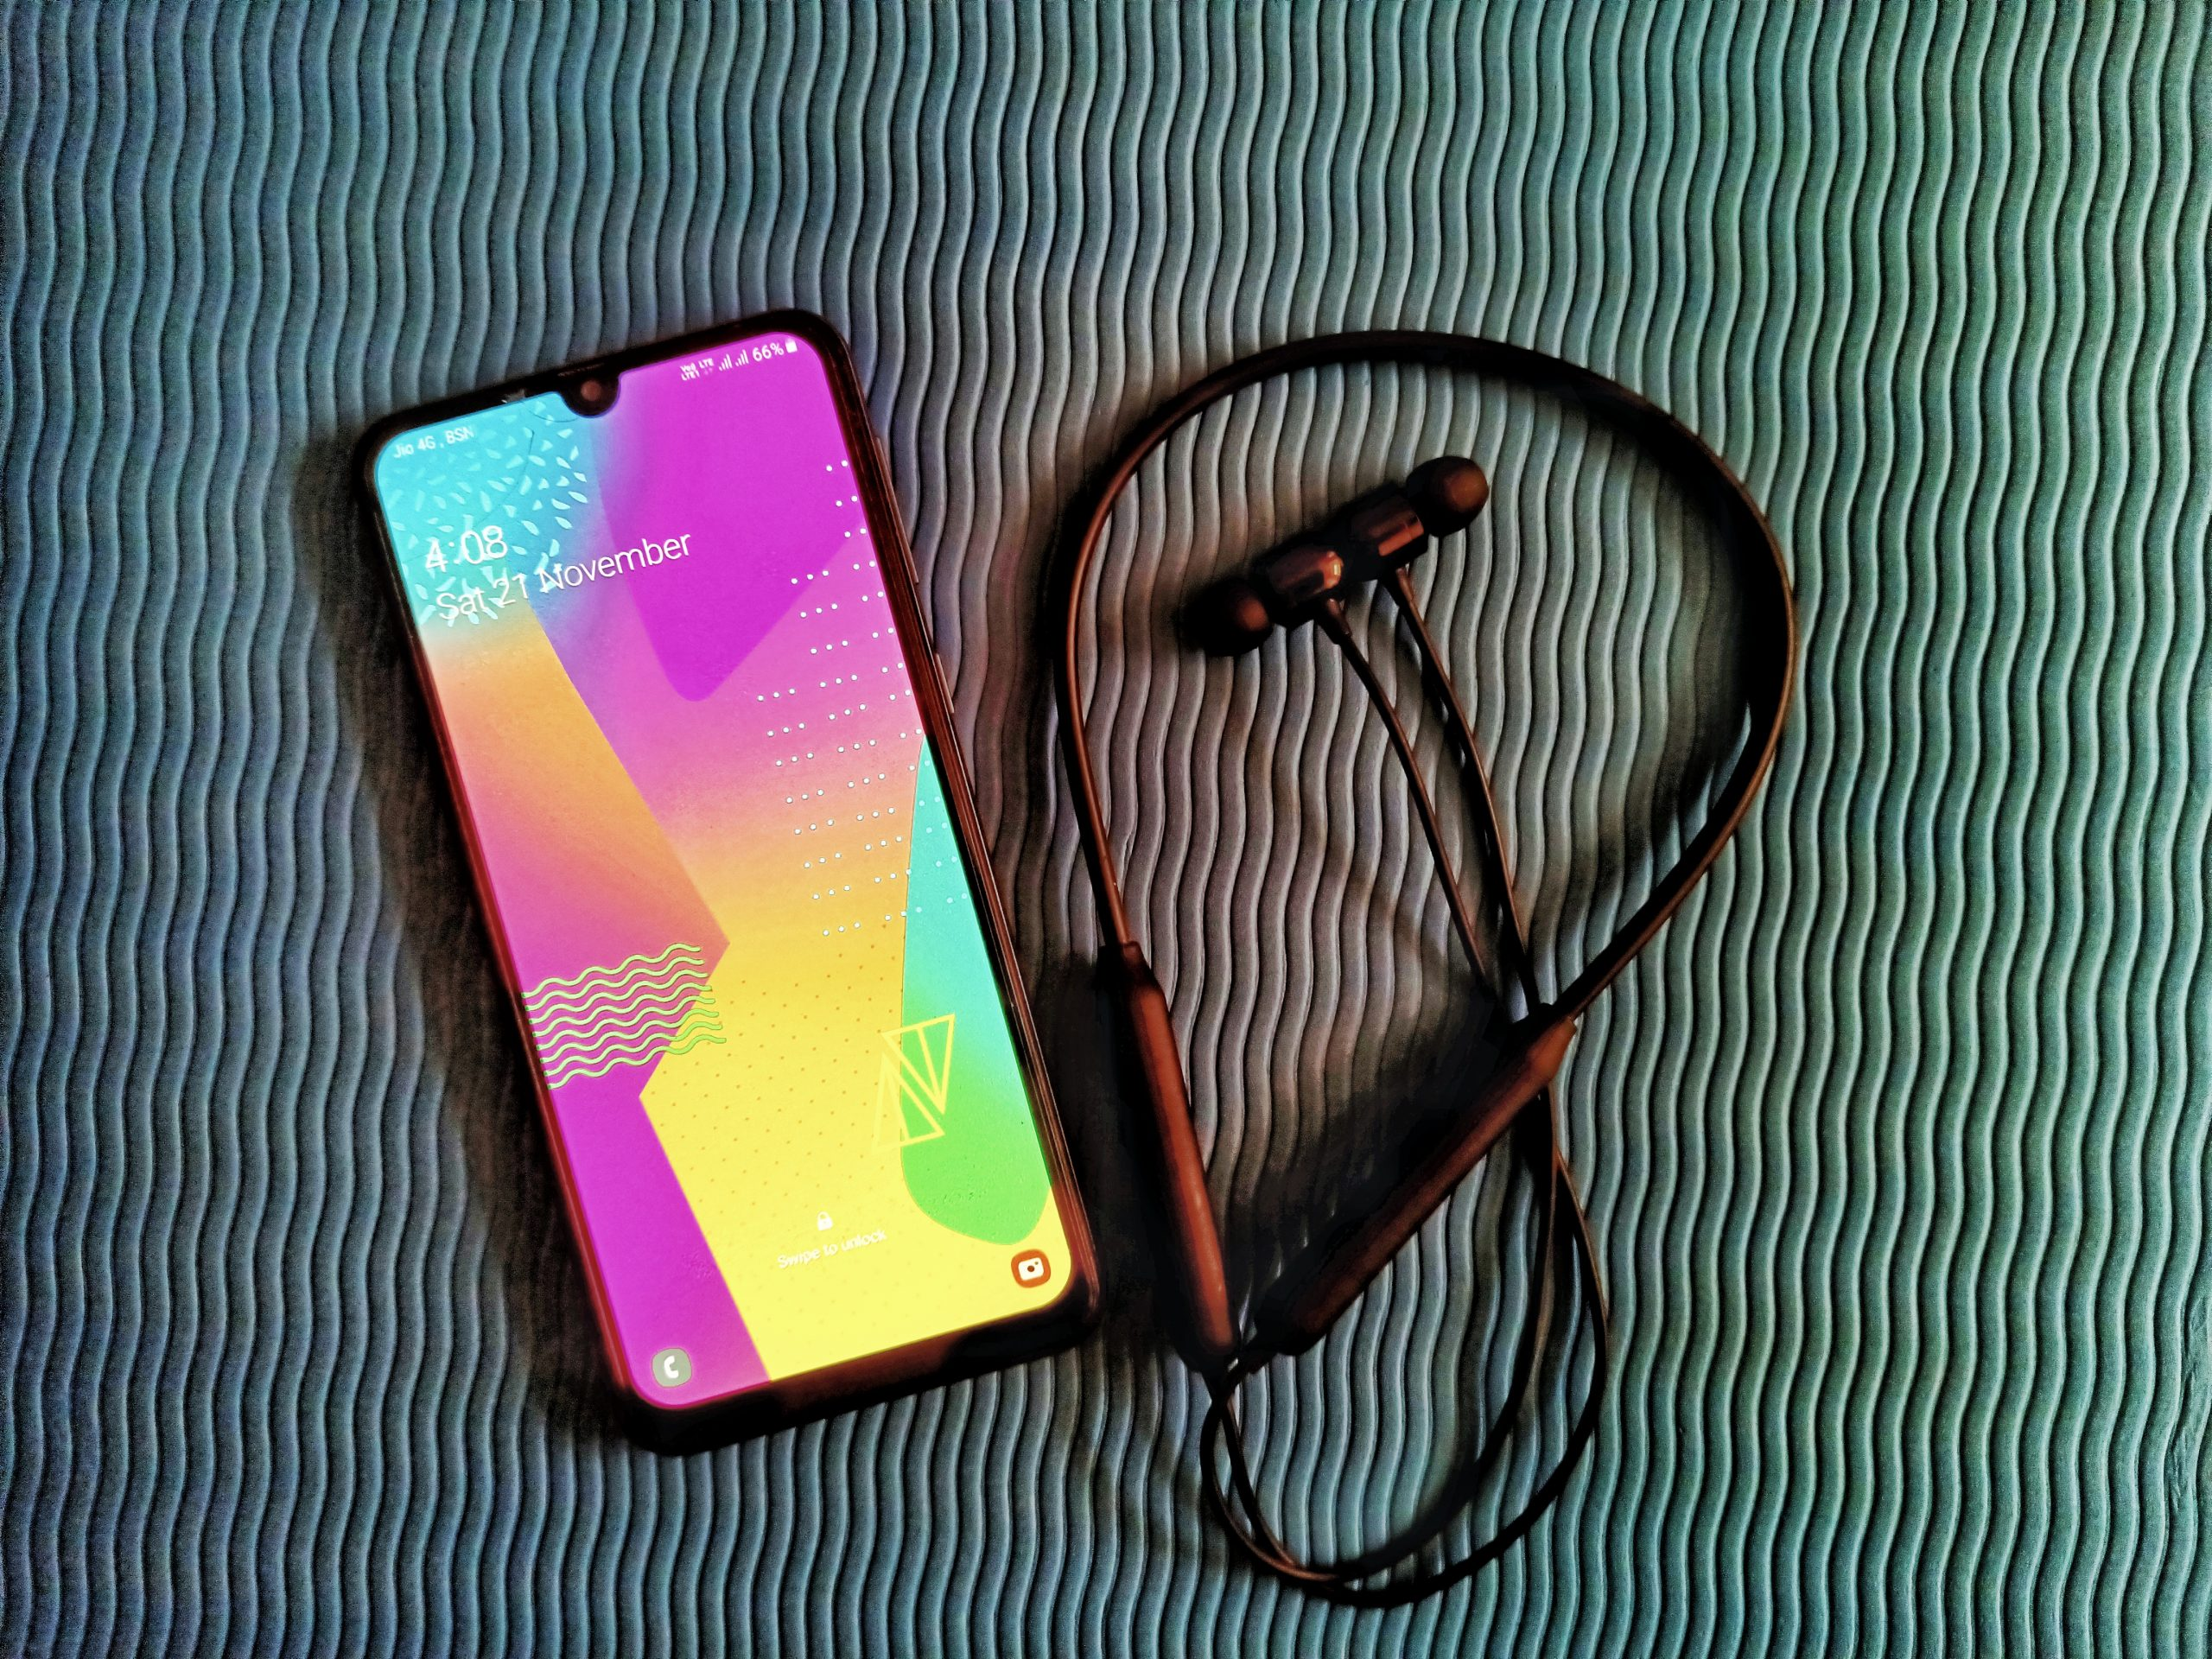 mobile and earphones